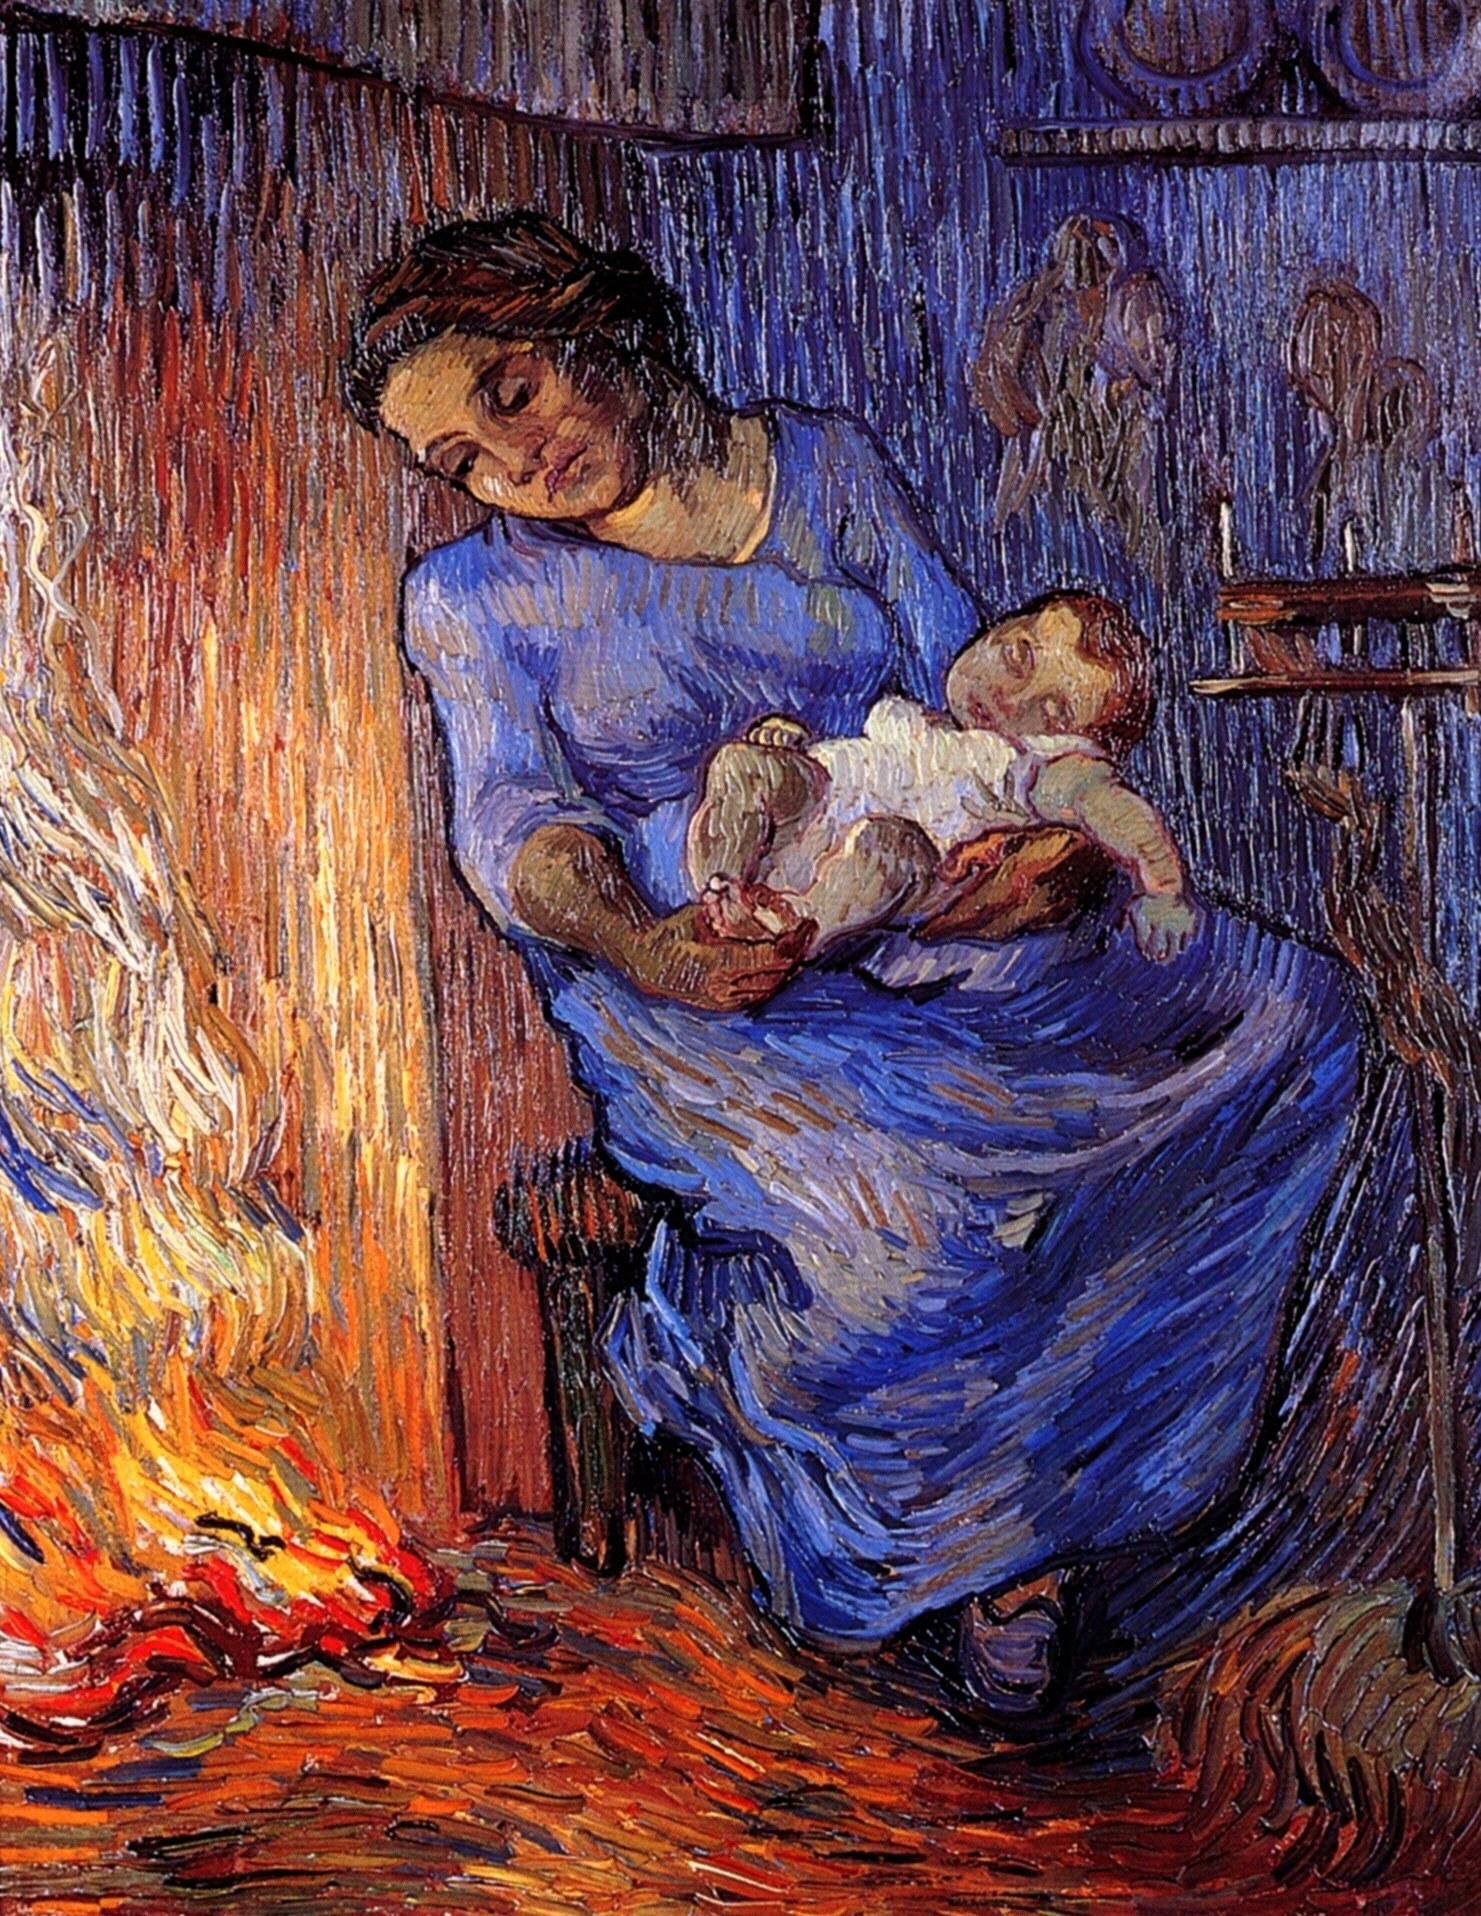 reebok runtone meilleur prix - The Man is at Sea (after Demont-Breton) - Vincent van Gogh ...